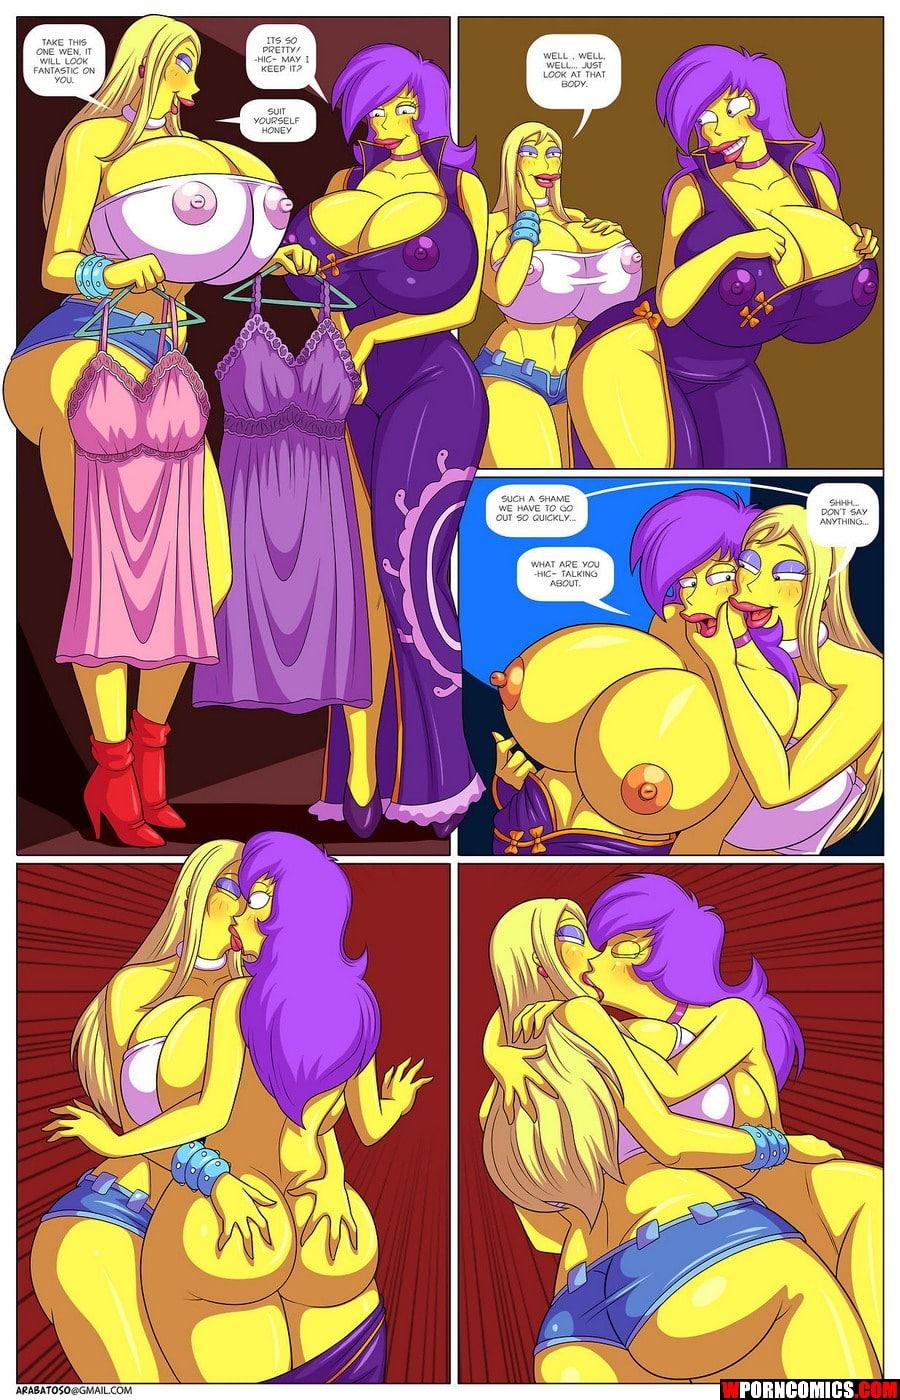 porn-comic-simpsons-darrens-adventure-part-4-2020-03-22/porn-comic-simpsons-darrens-adventure-part-4-2020-03-22-37969.jpg